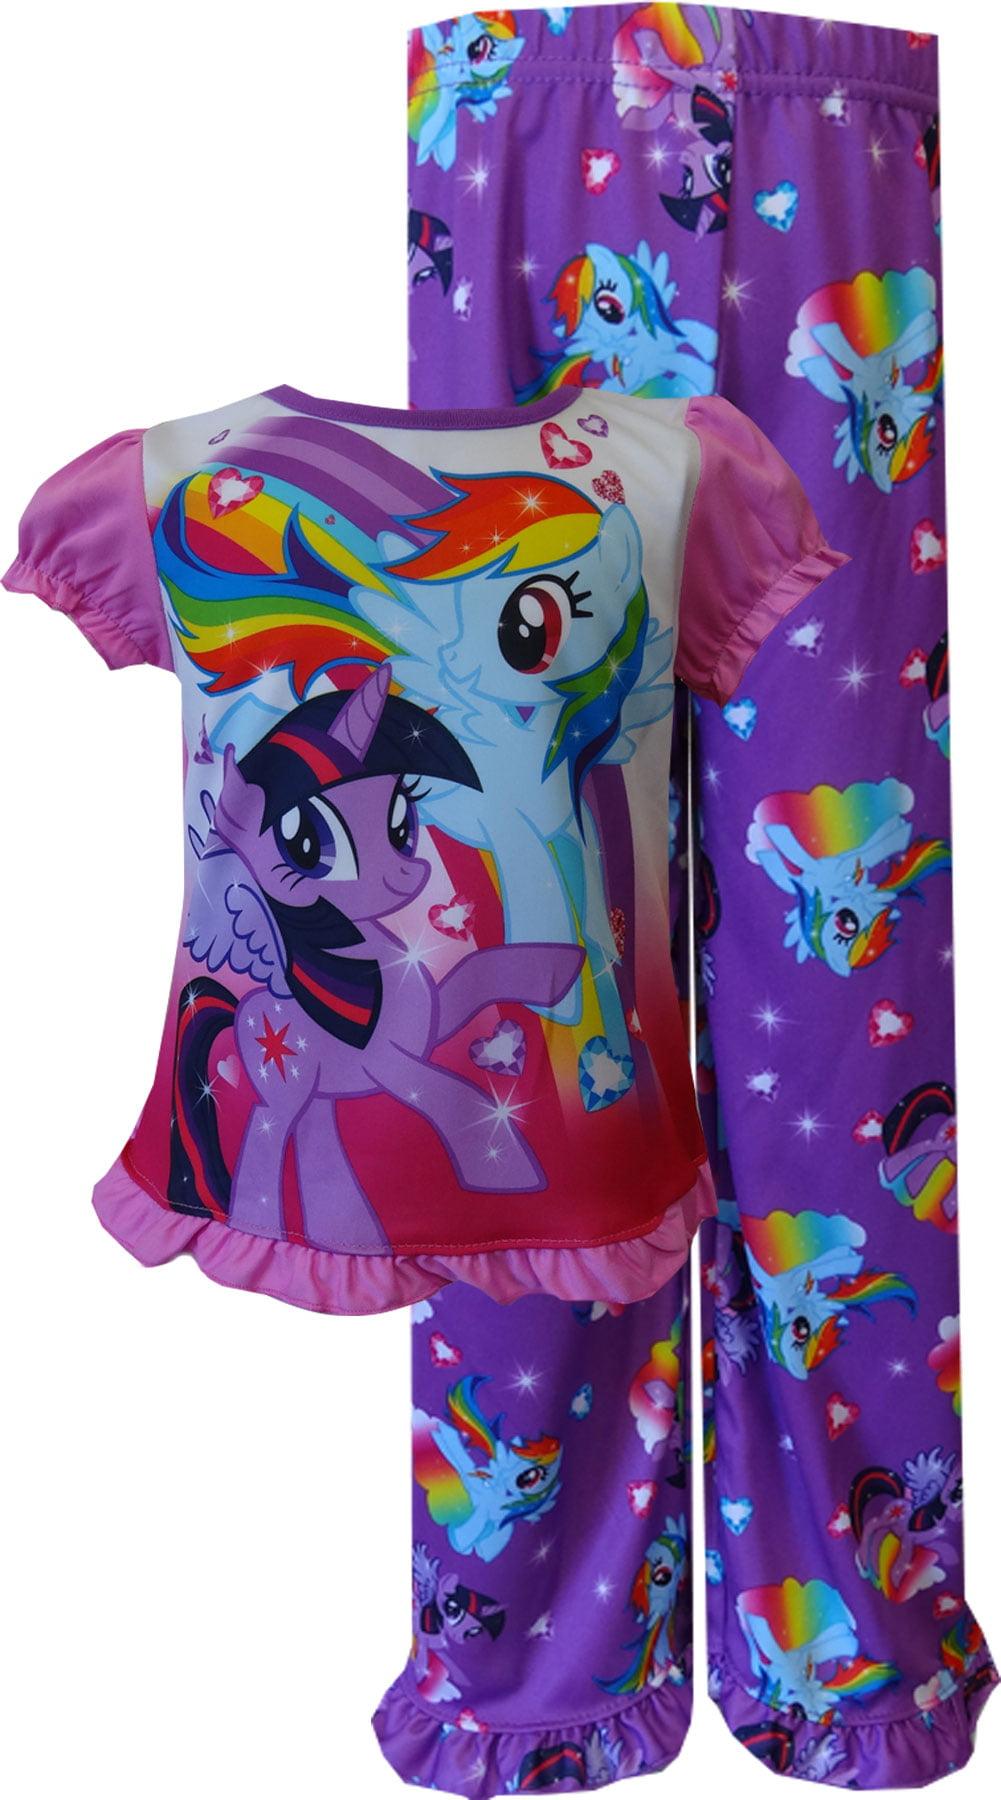 41ced9776a9f My Little Pony - My Little Pony Rainbow Dash and Twilight Sparkle ...